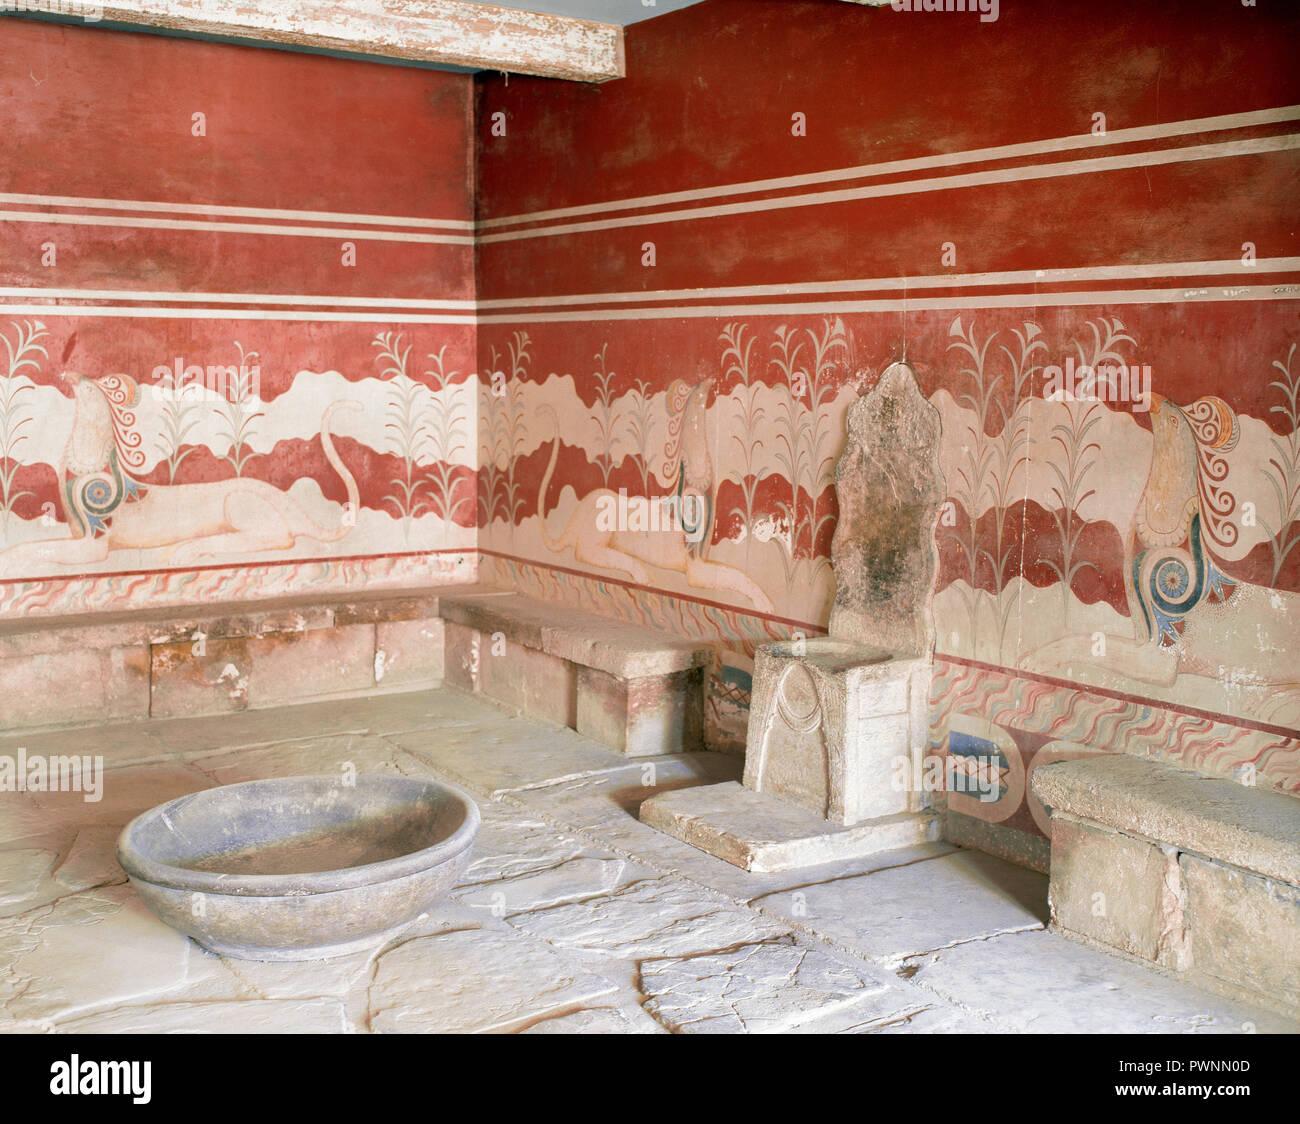 Greece, Crete. Palace of Knossos (1700-1450 BC). Throne Room, 15th century BC. - Stock Image